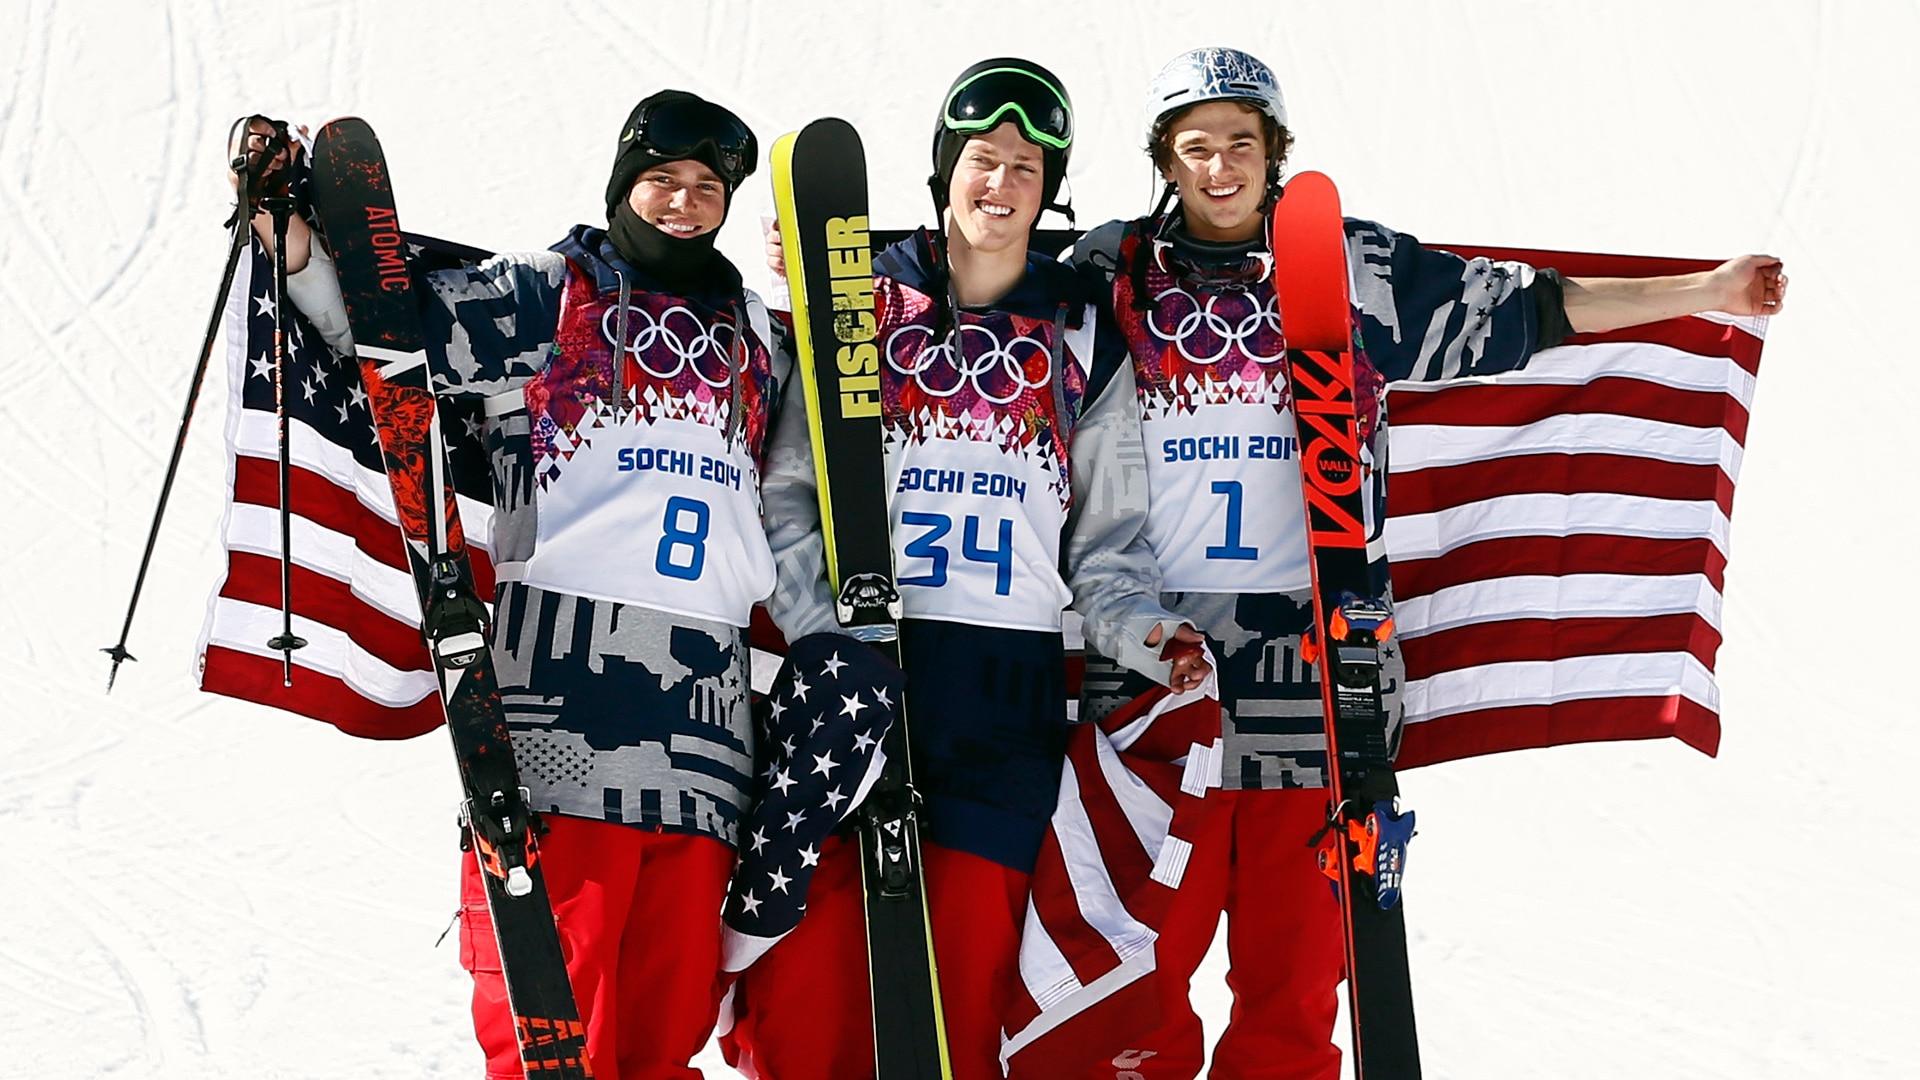 USA sweeps ski slopestyle podium at Sochi 2014